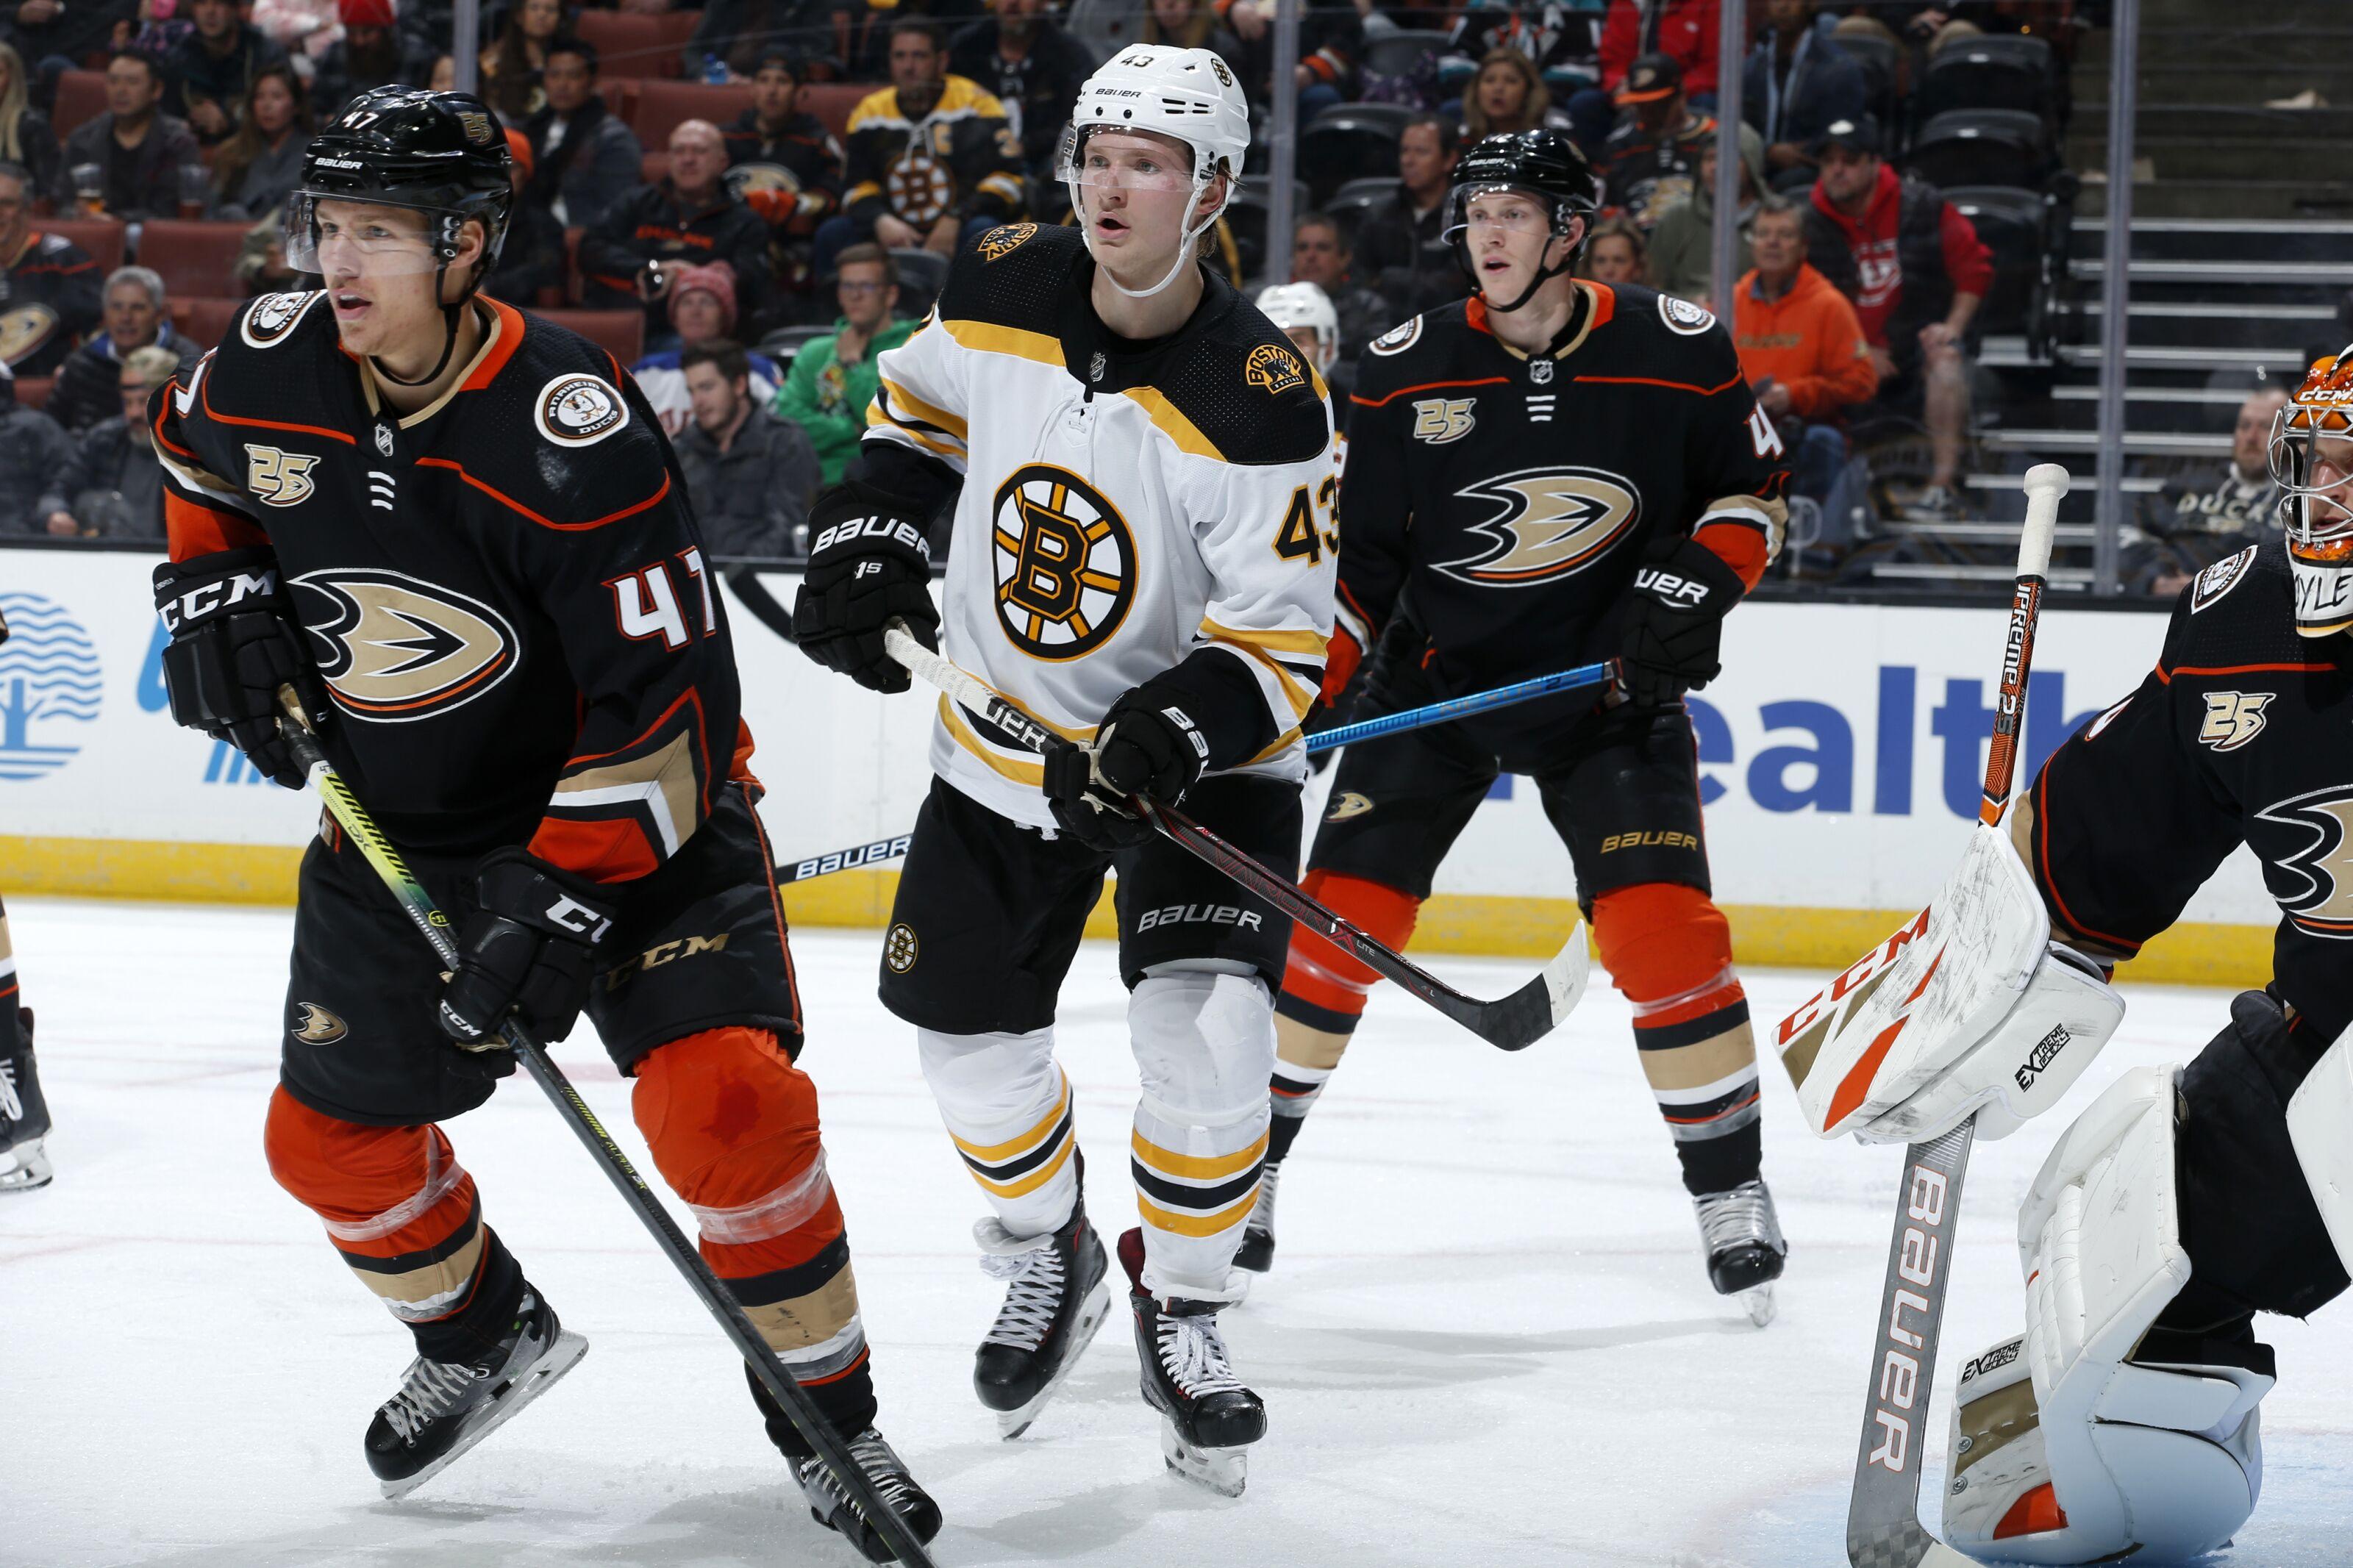 Anaheim Ducks vs Boston Bruins: Start time, live streaming, TV info